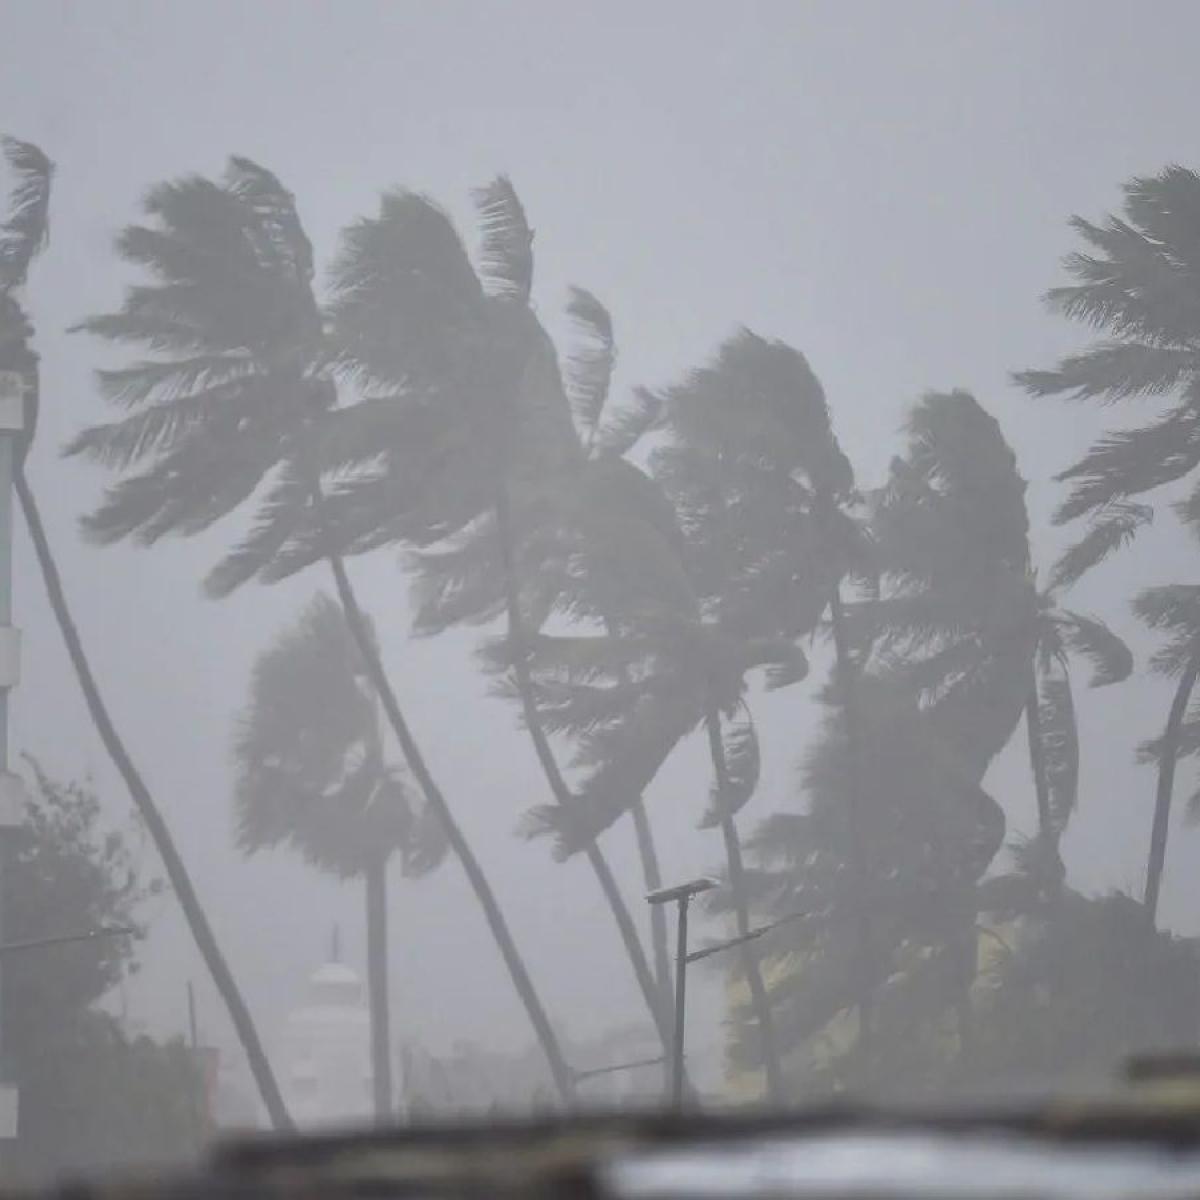 IMD issues cyclonic storm warning, predicts heavy rainfall in parts of Maharashtra and Gujarat